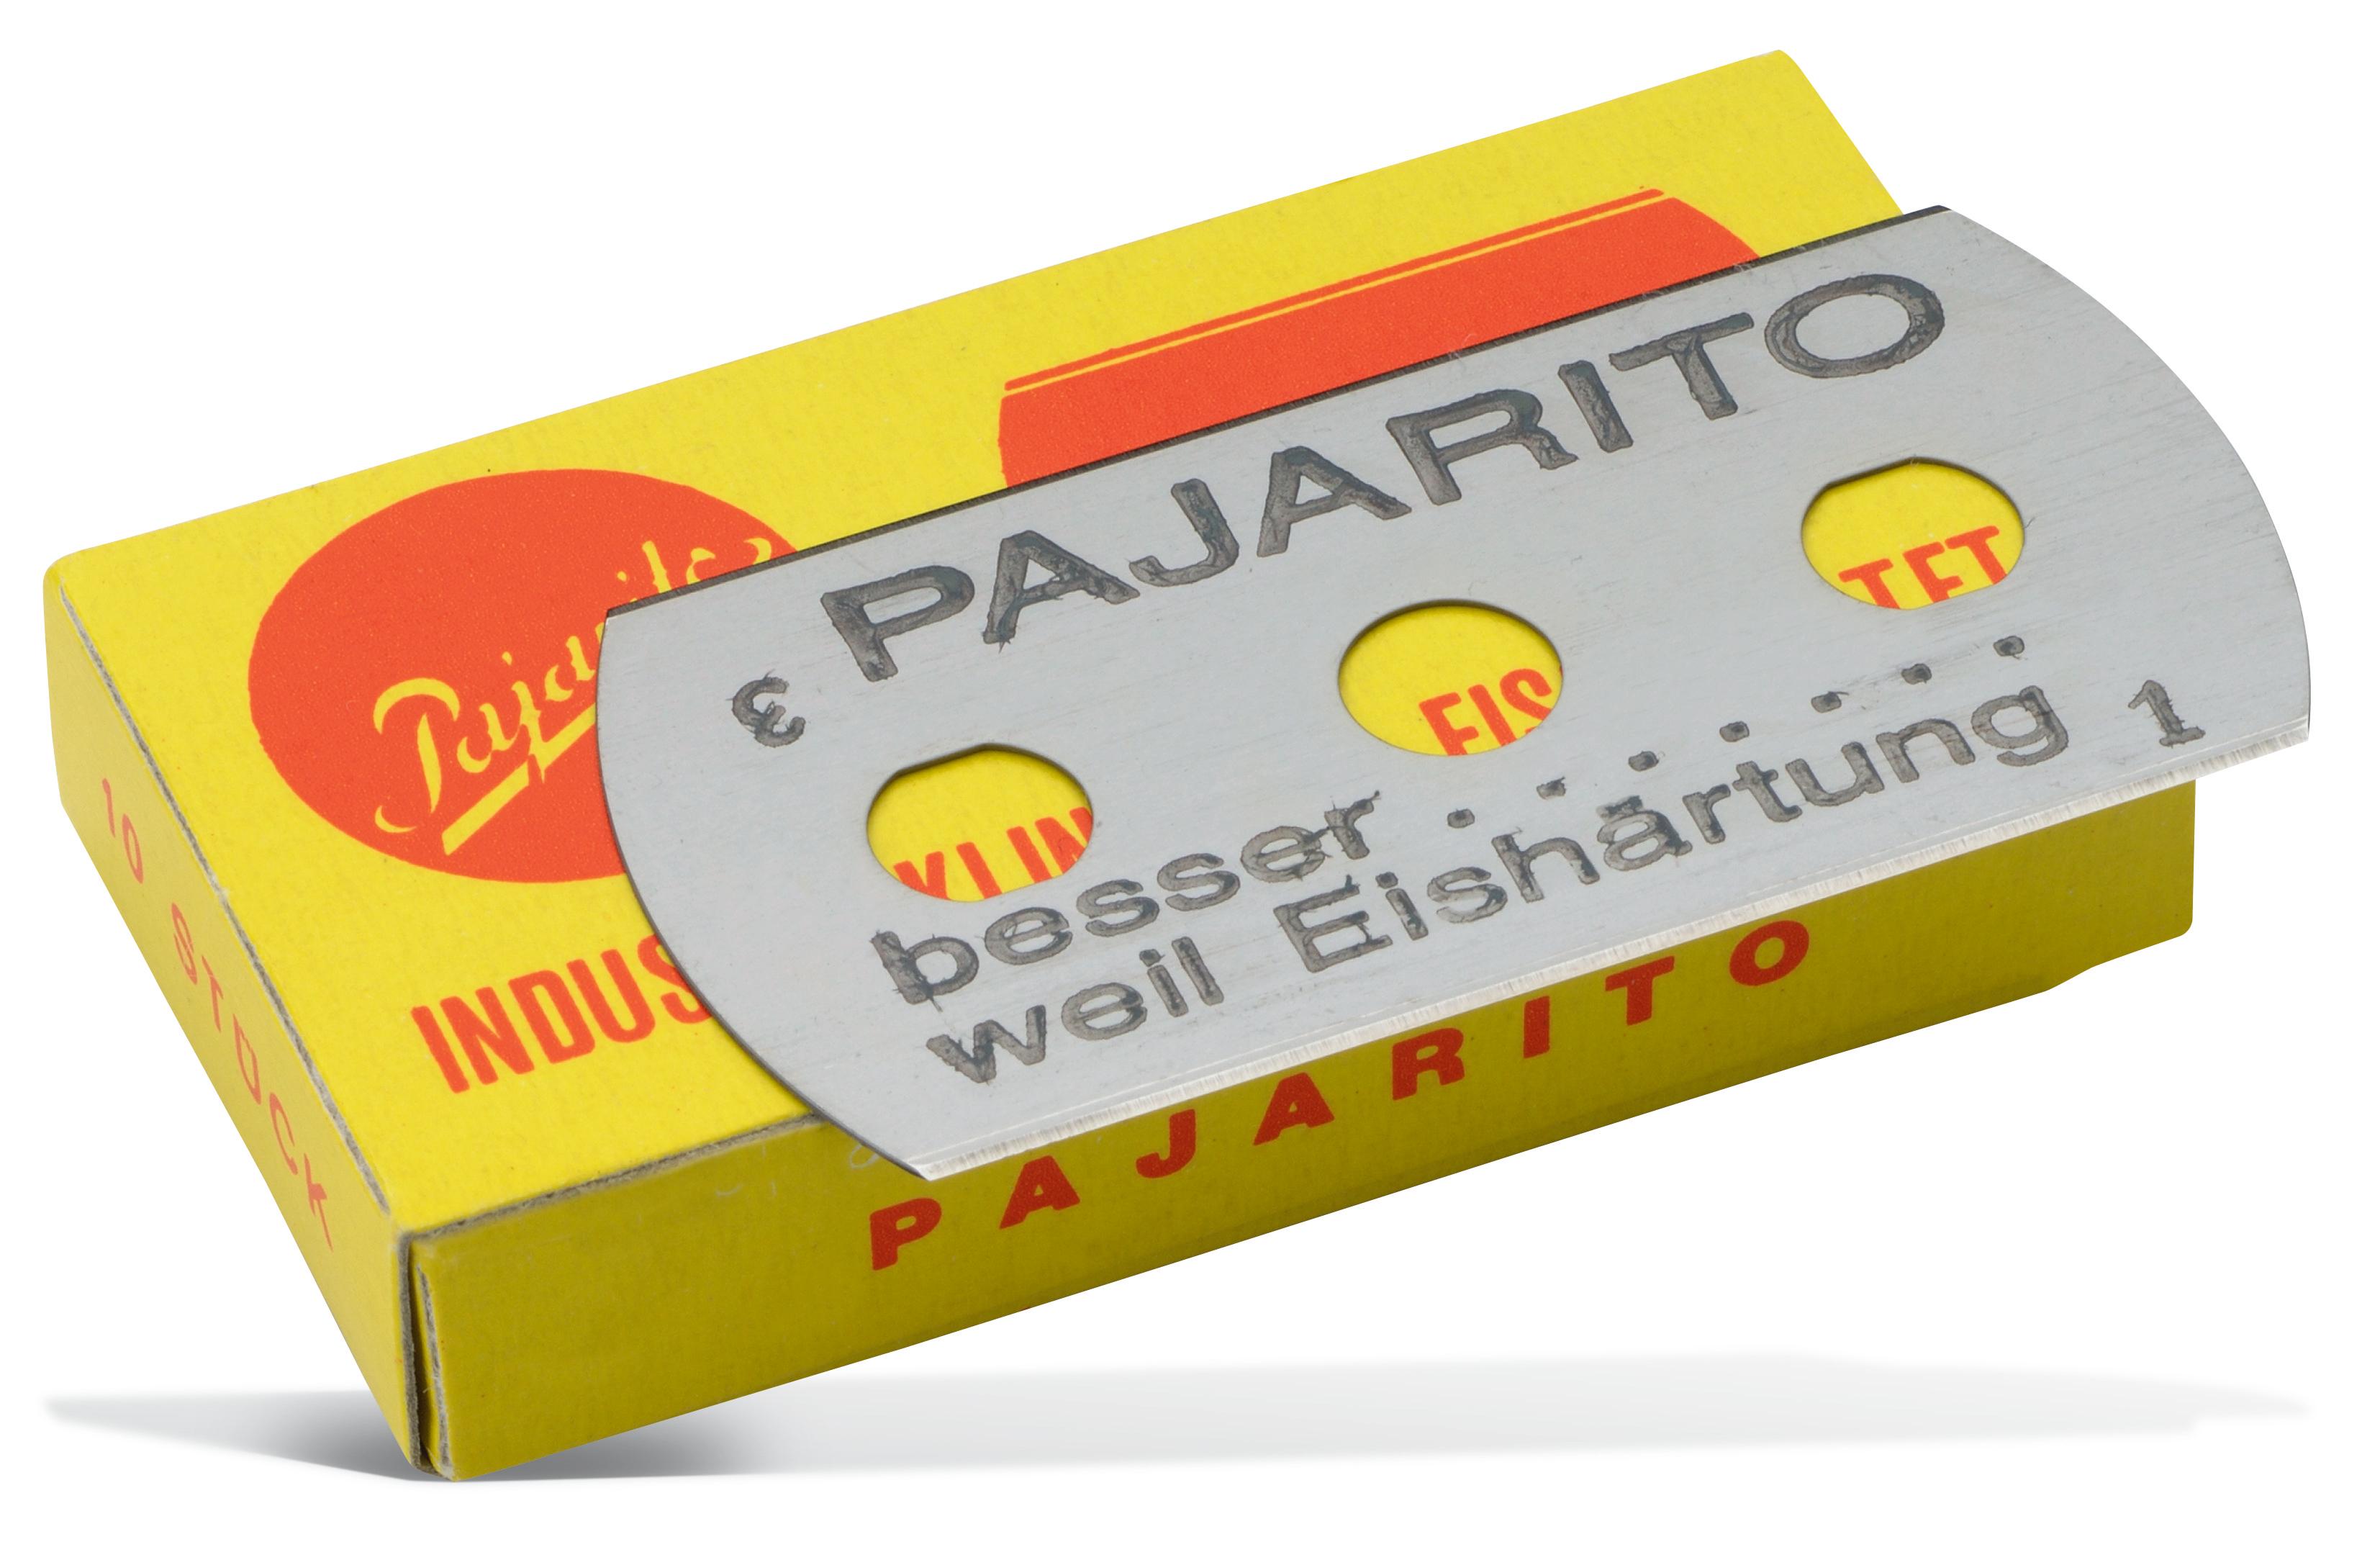 3-Loch-Industrieklinge Pajarito 10 Stück